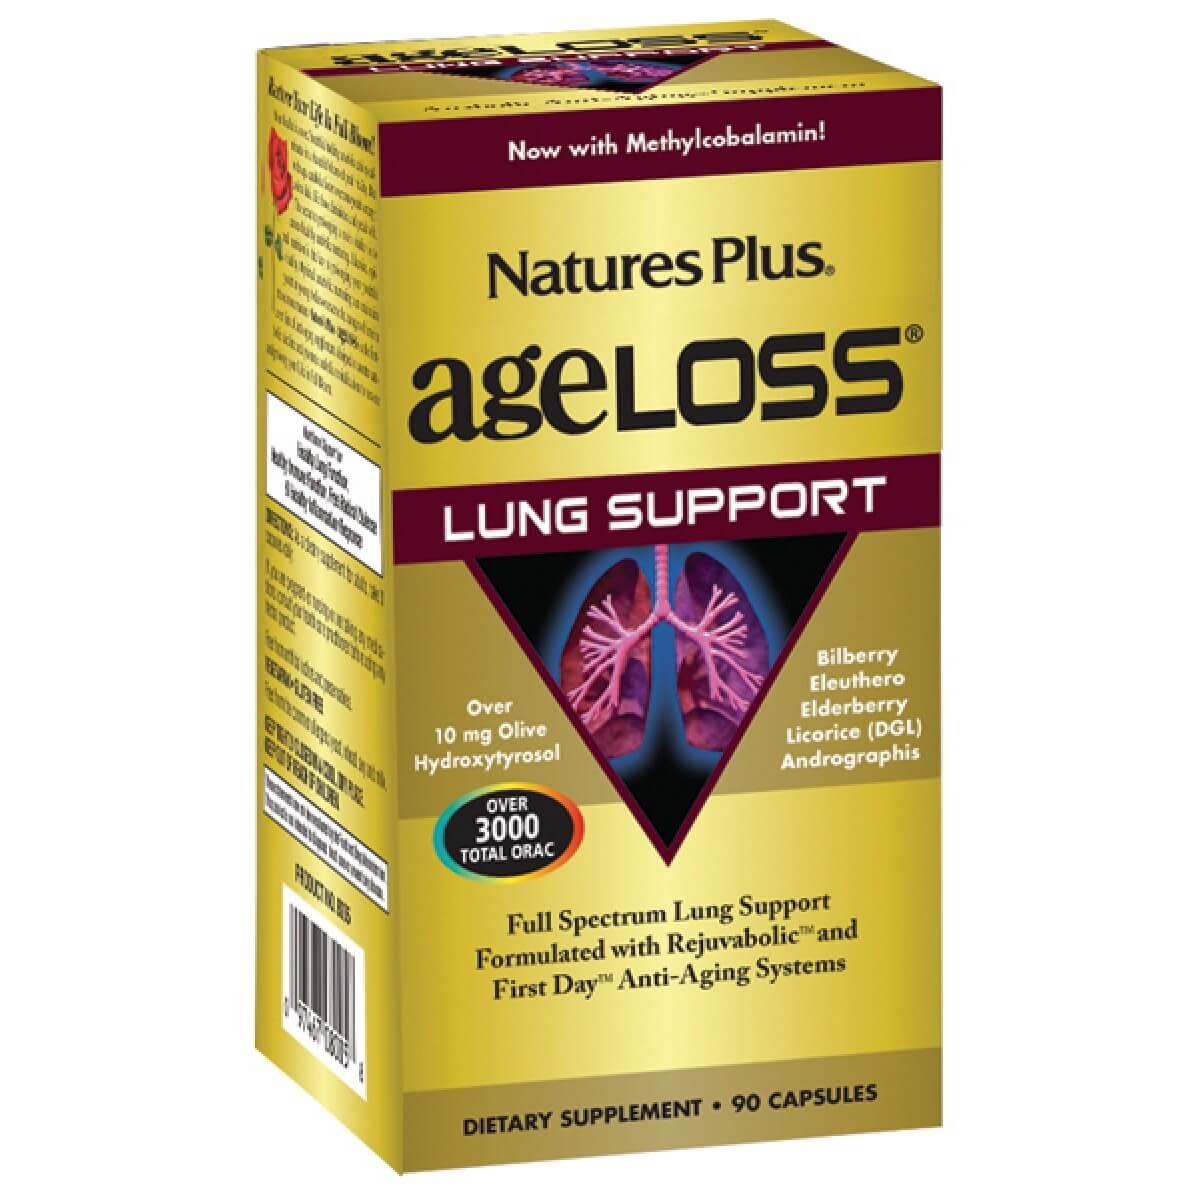 Natures Plus Ageloss Lung Support Συμπλήρωμα Διατροφής για την Υποστήριξη τωνΠνευμόνων90 Κάψουλες